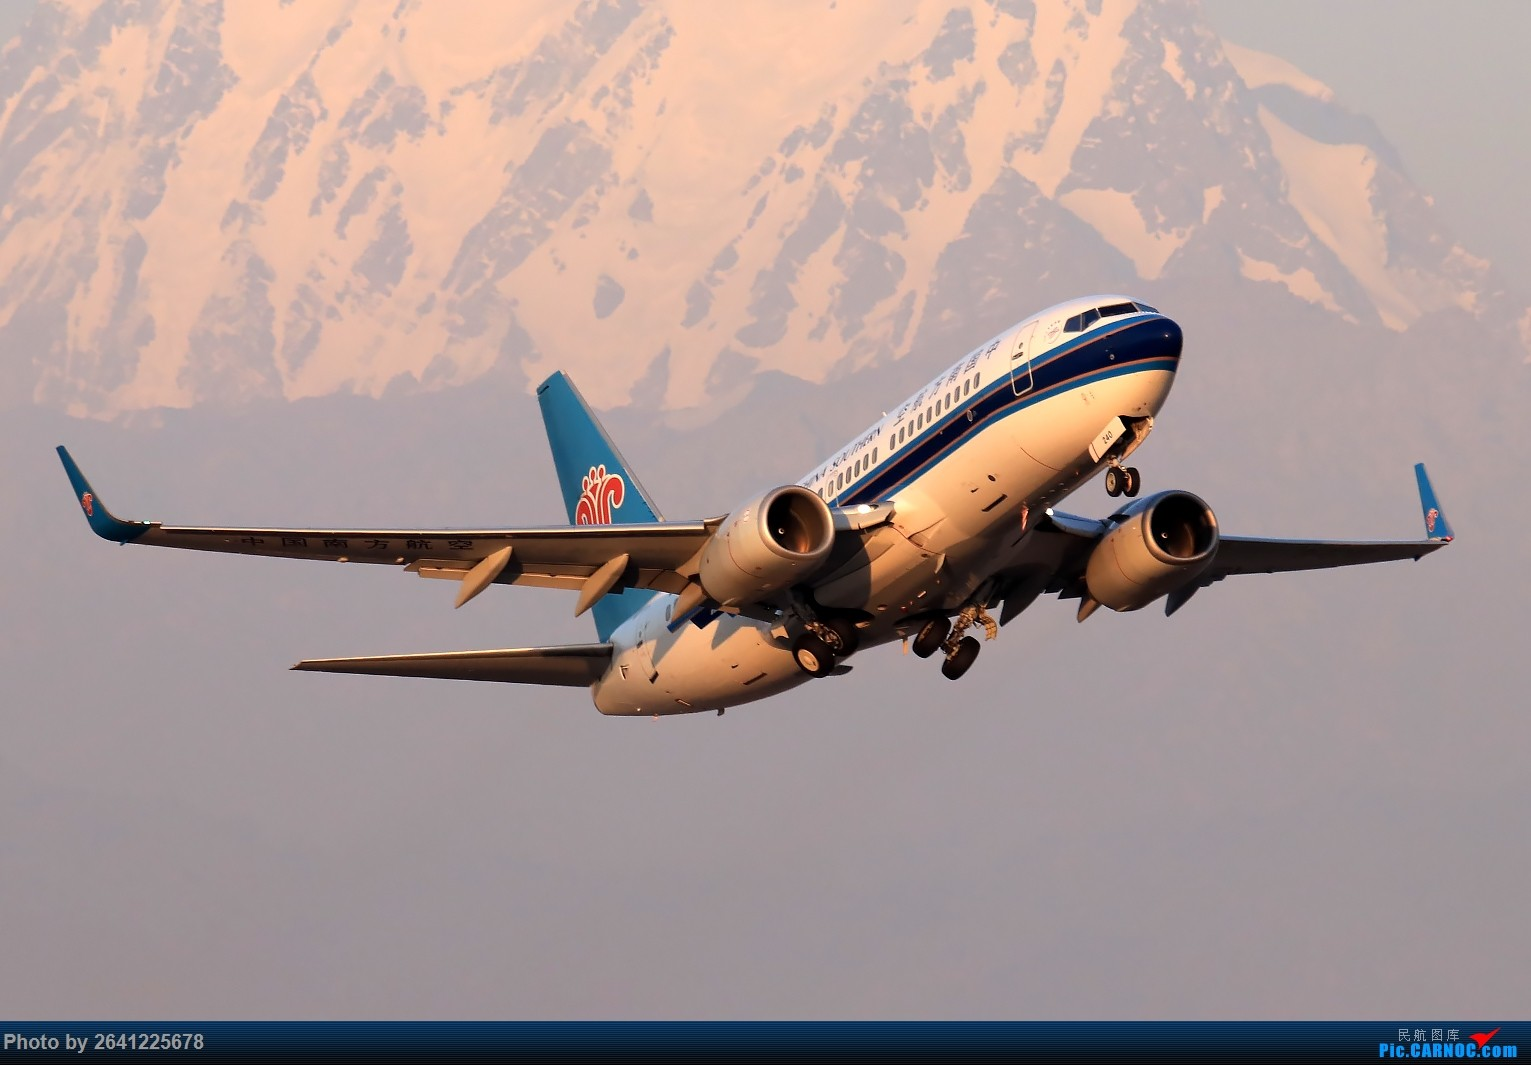 Re:[原创]【小周游记第7集拍机贴】乌鲁木齐绝美的地景和光线 BOEING 737-700 B-5240 中国乌鲁木齐地窝堡国际机场